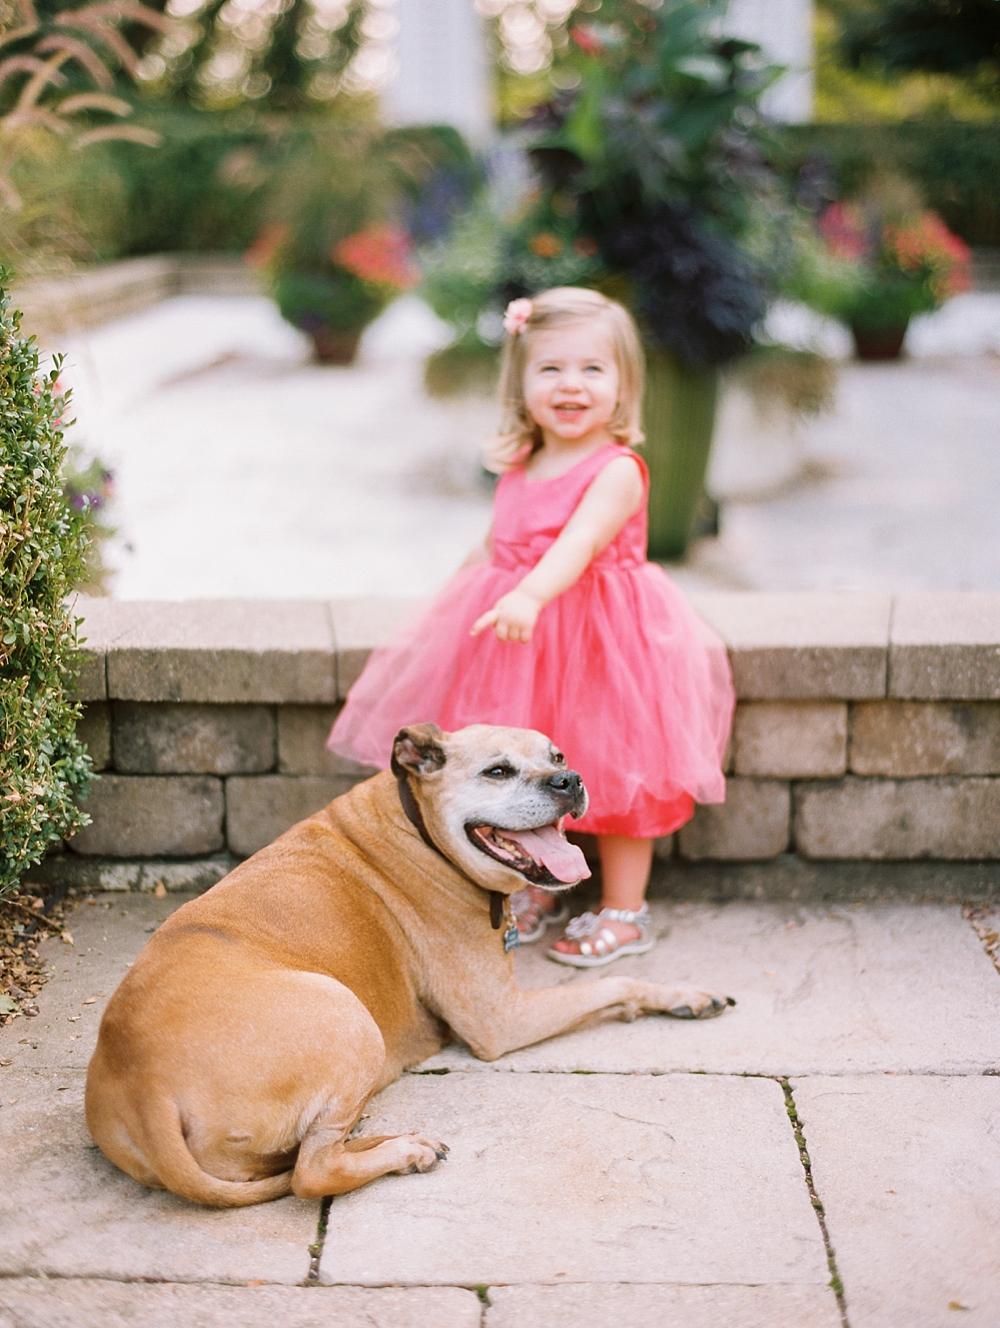 kristin-la-voie-photography-lifestyle-chicago-dog-16